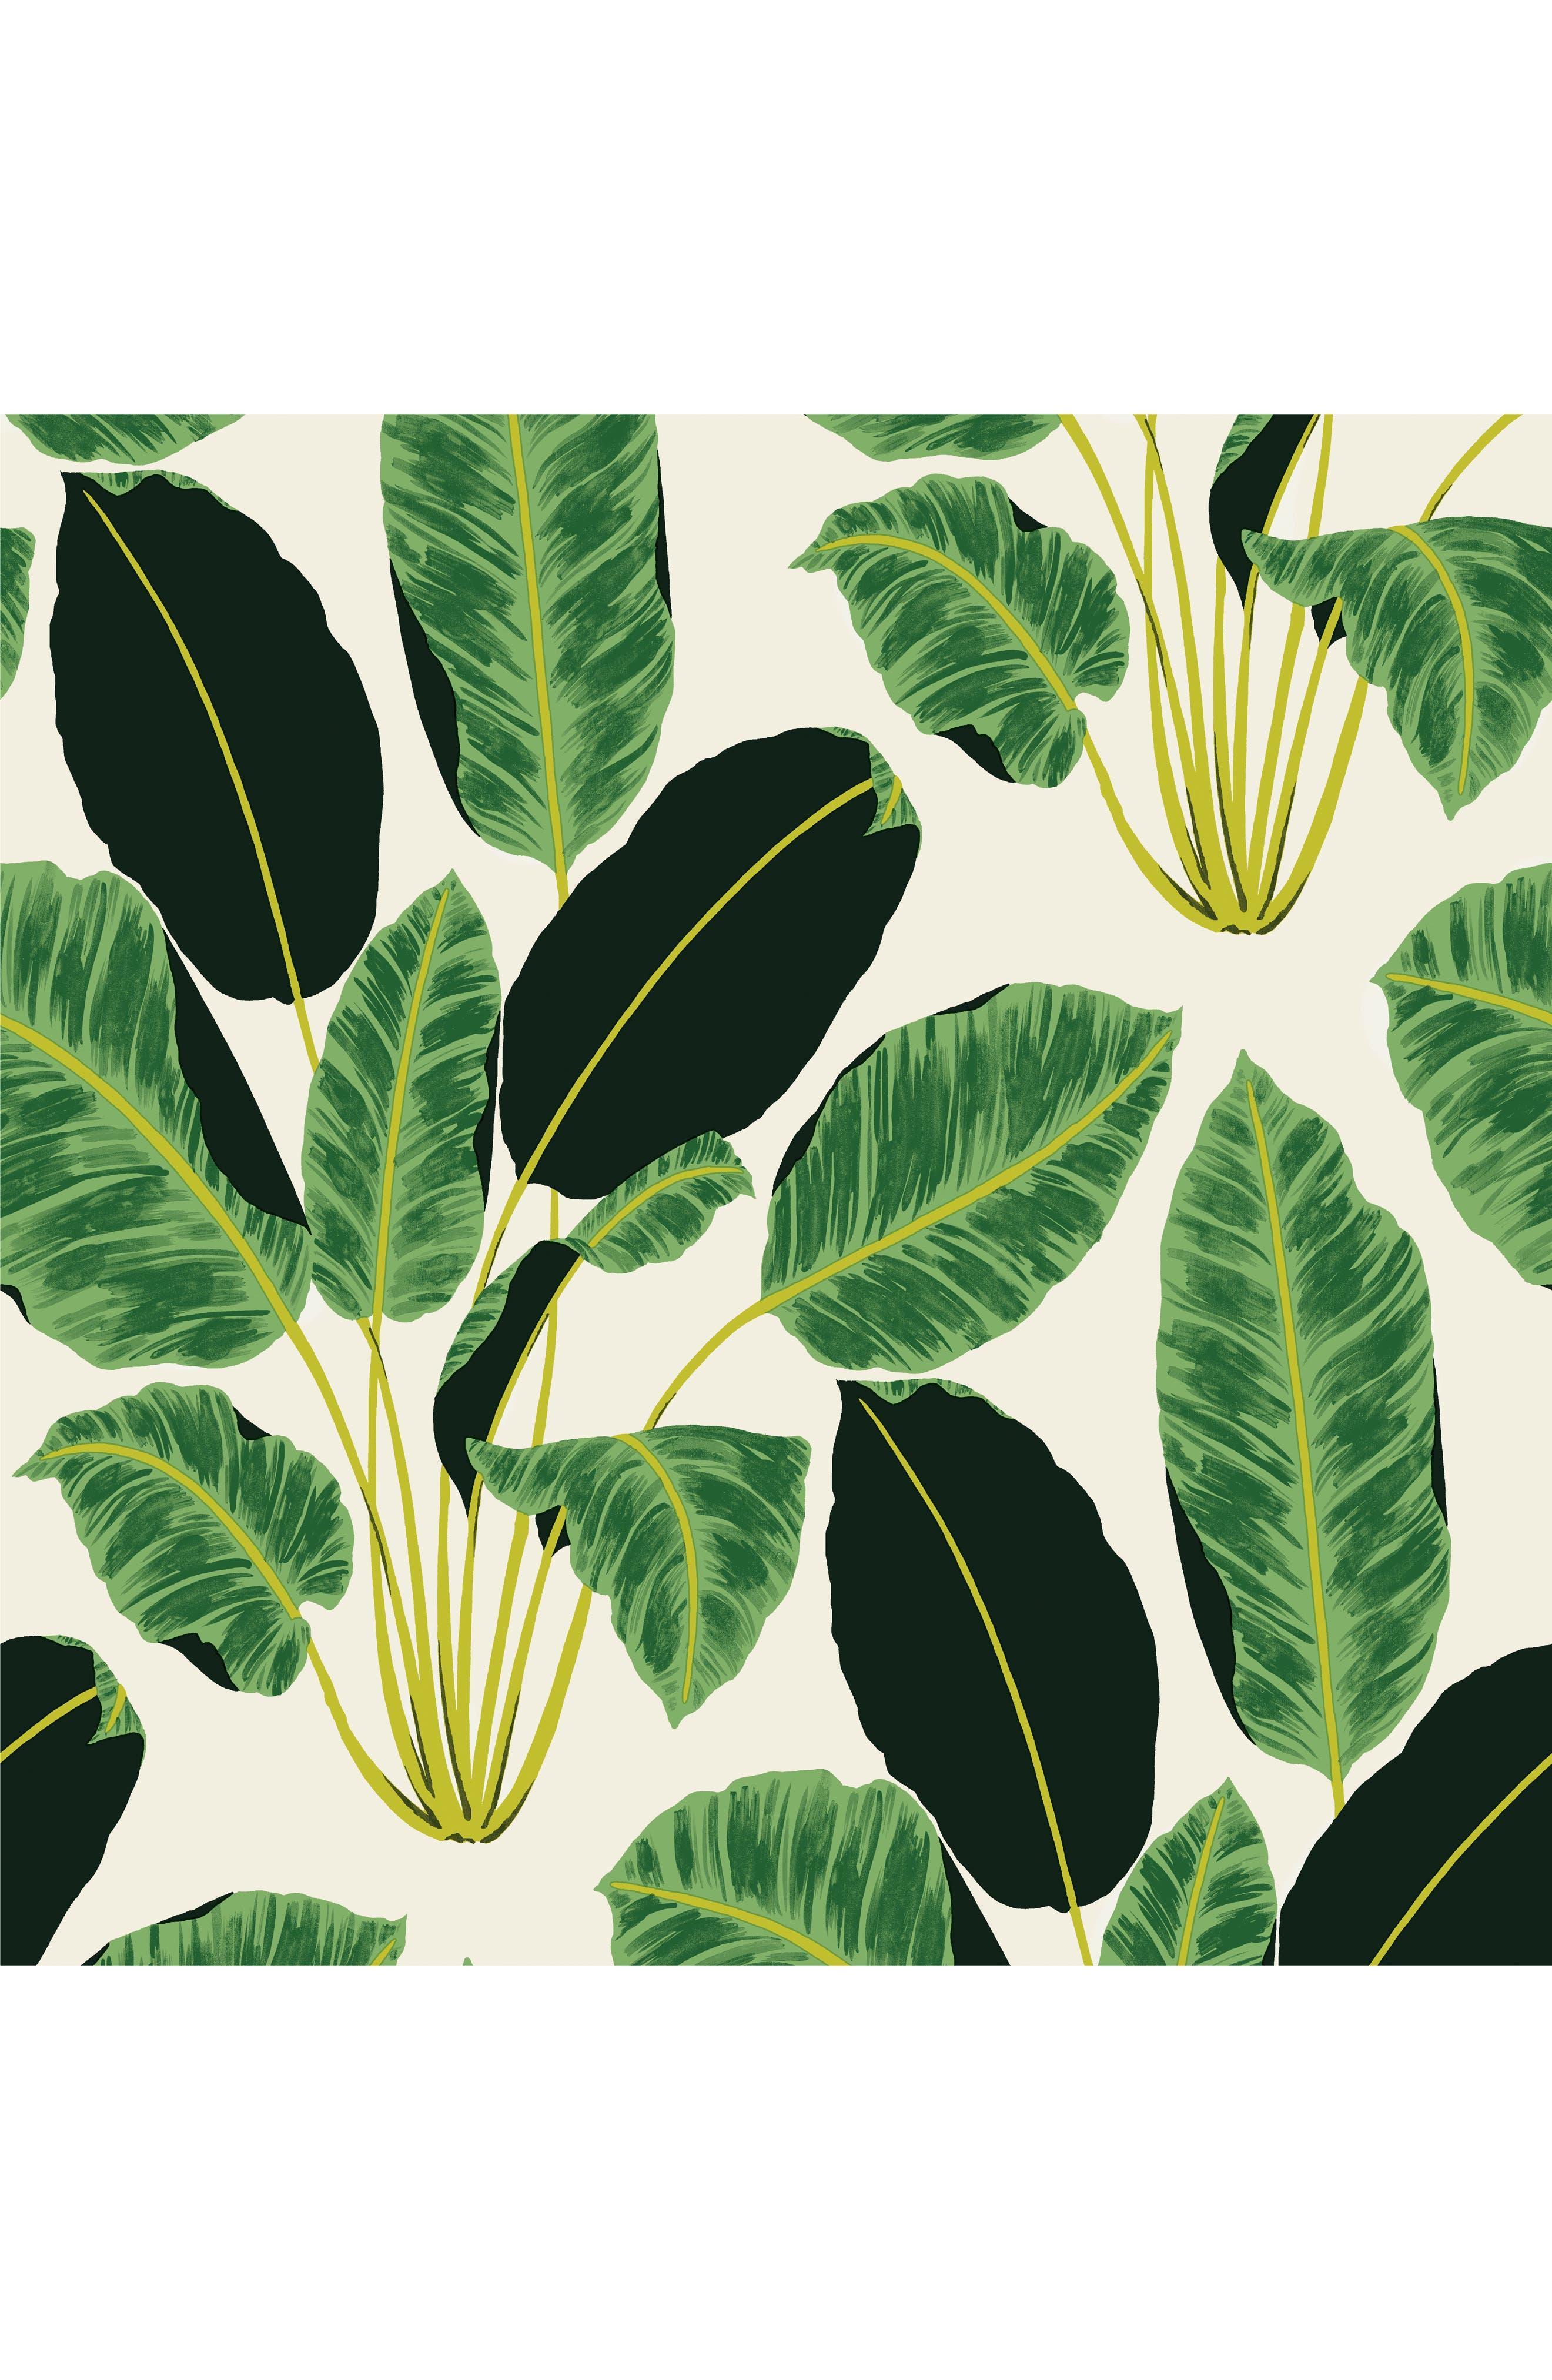 Hojas Cubanas Self-Adhesive Vinyl Wallpaper,                             Main thumbnail 1, color,                             300